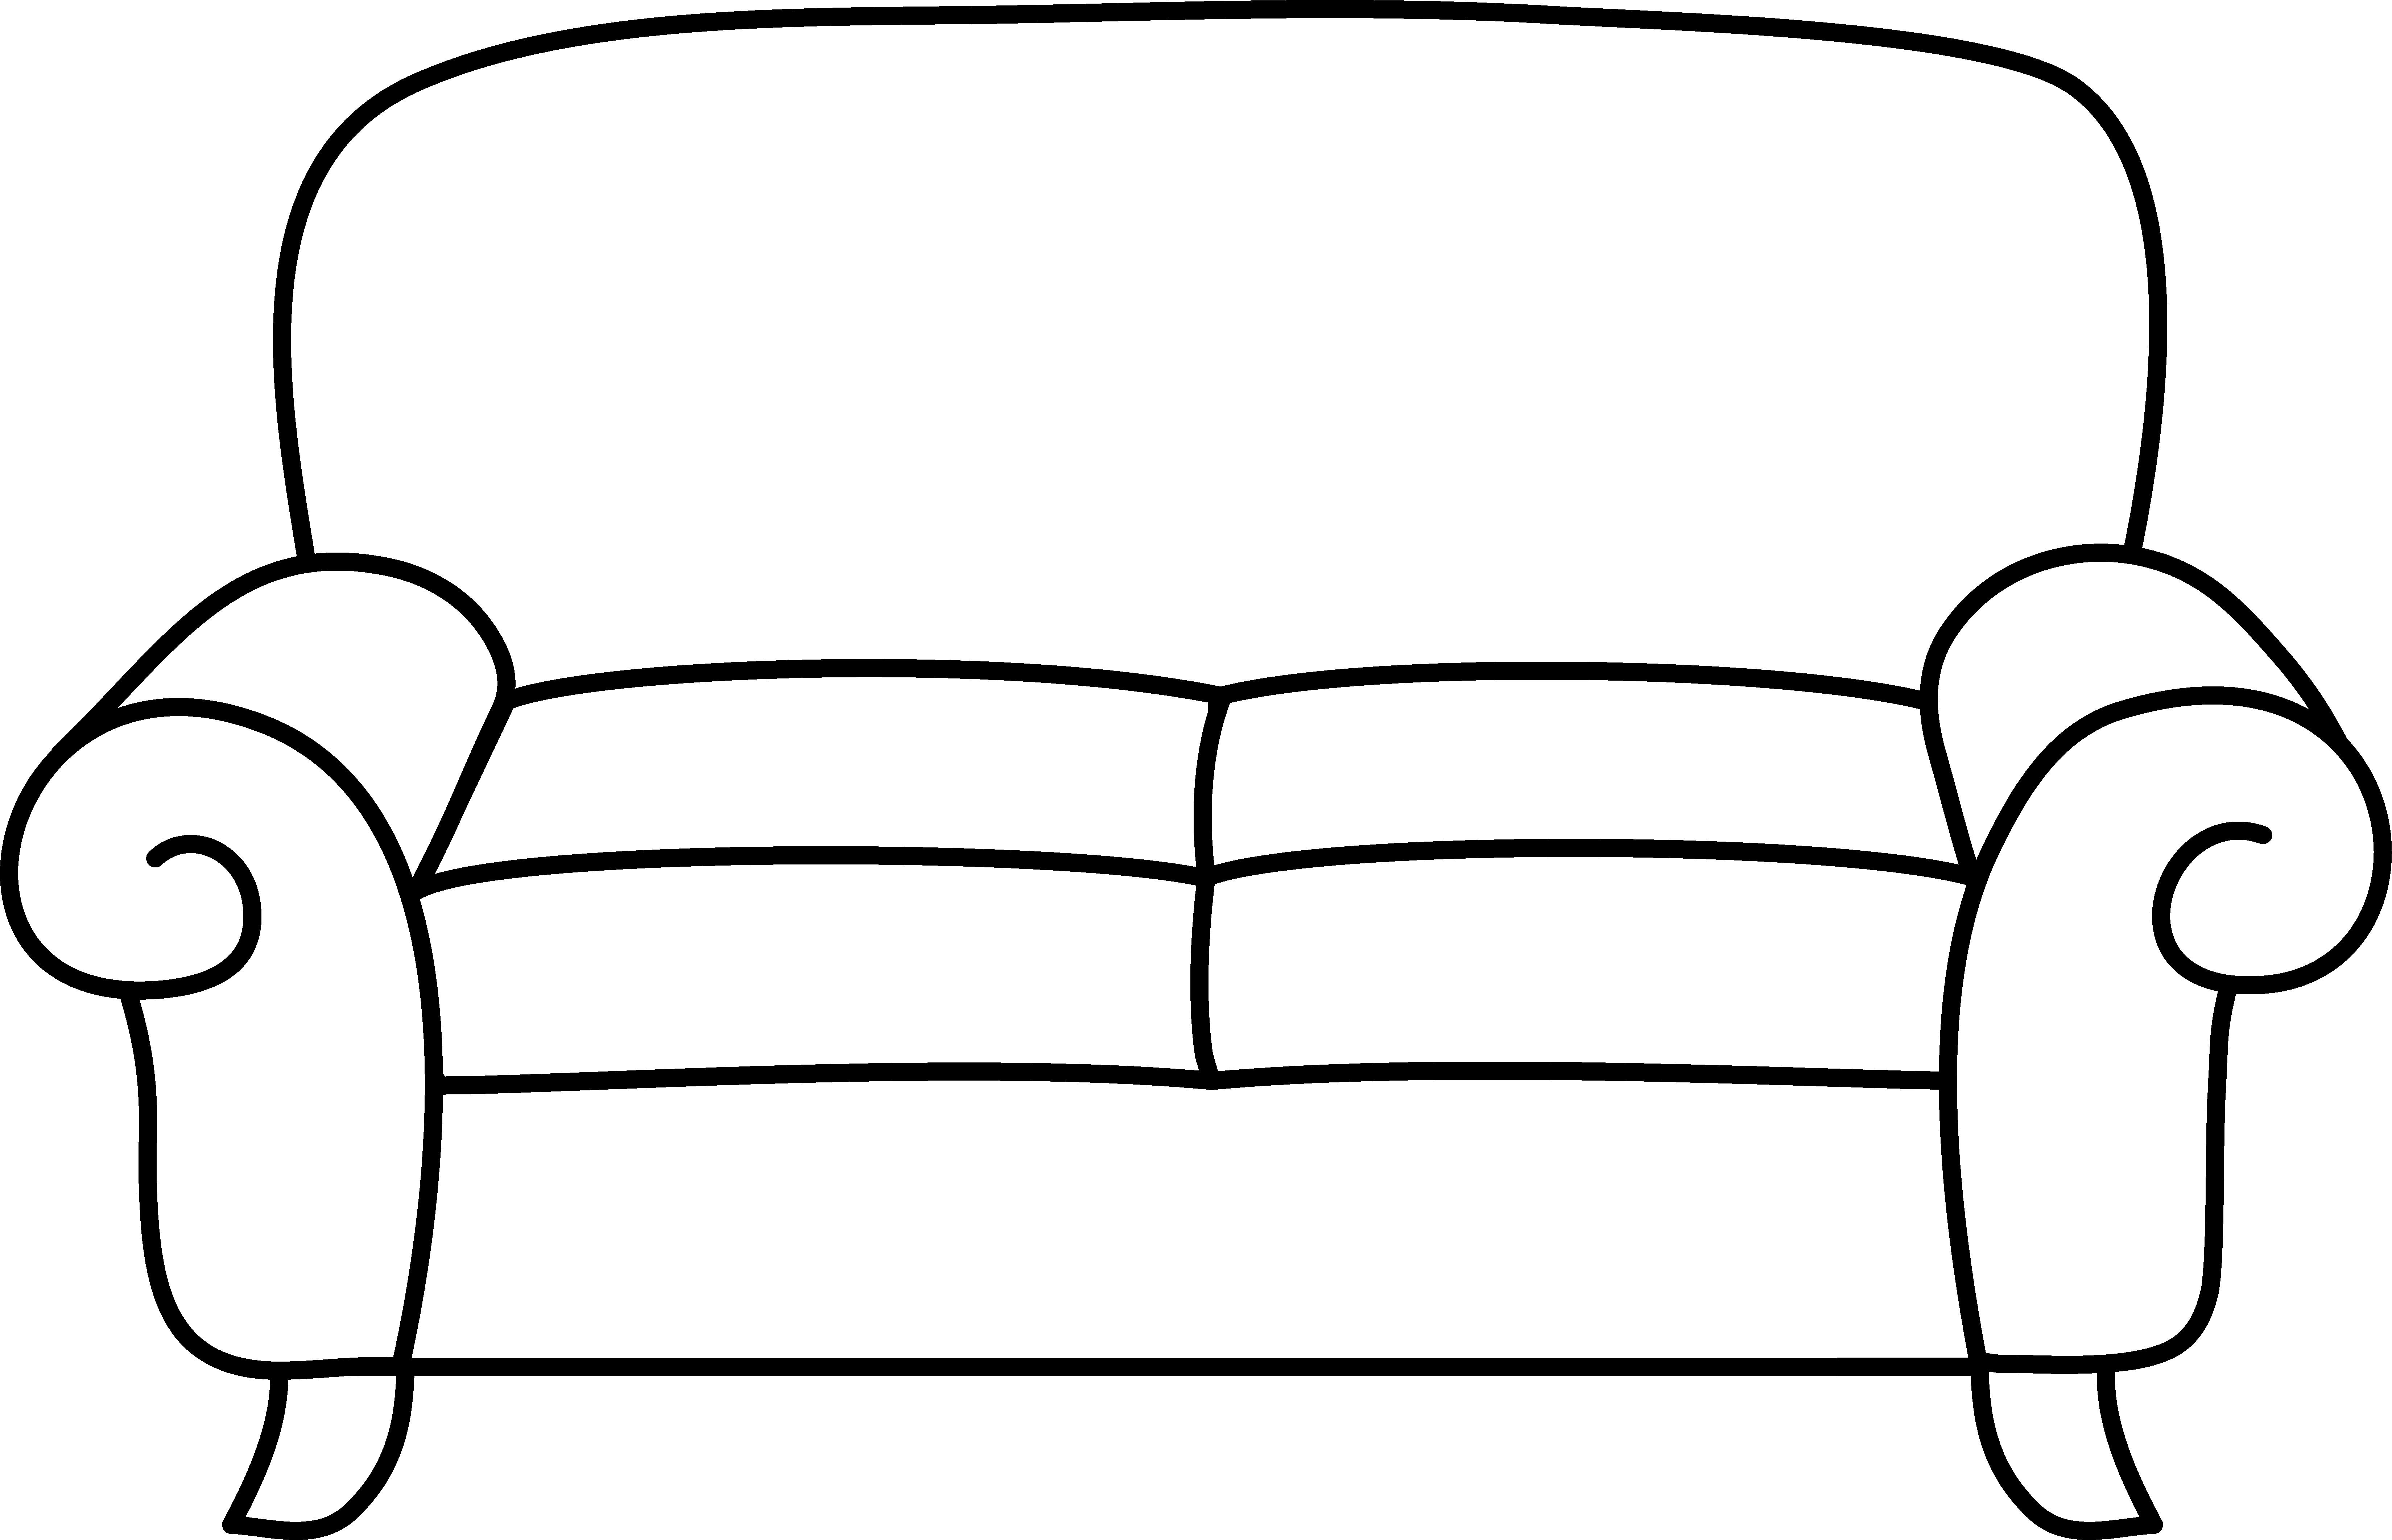 Sofa clipart #17, Download drawings